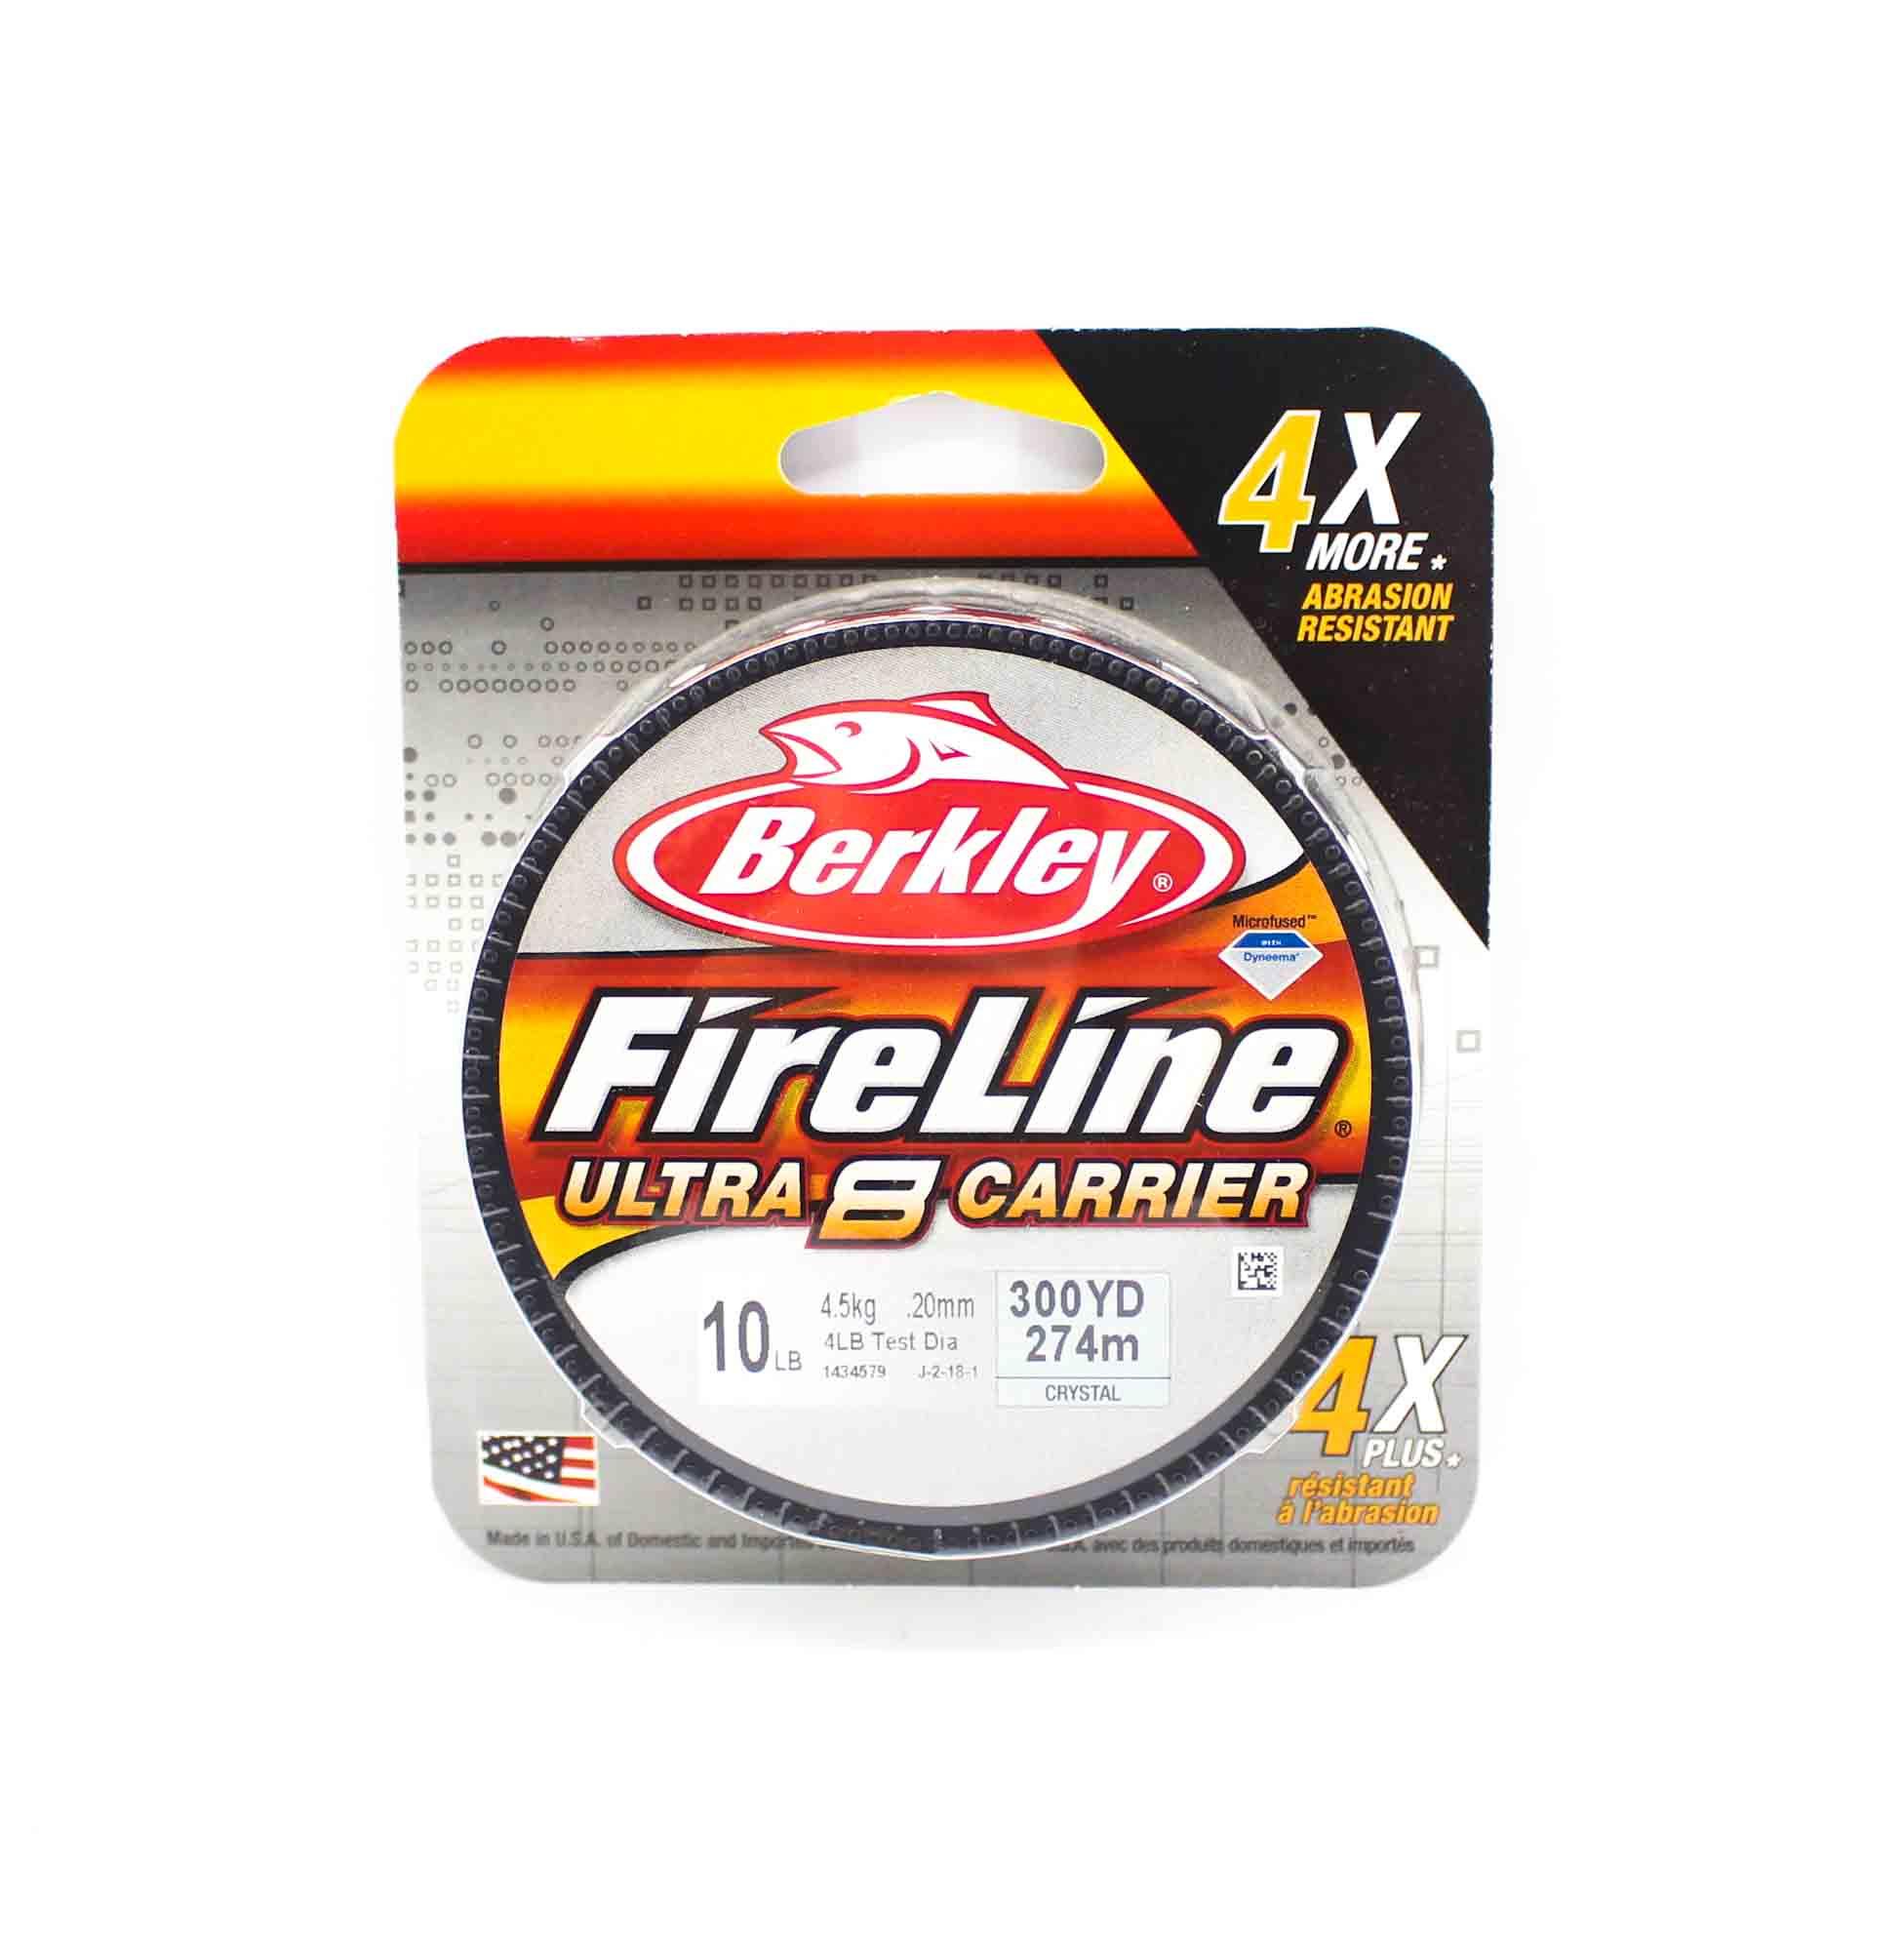 Berkley Fireline Ultra 8 Carrier 300yds 10lb White (4557)